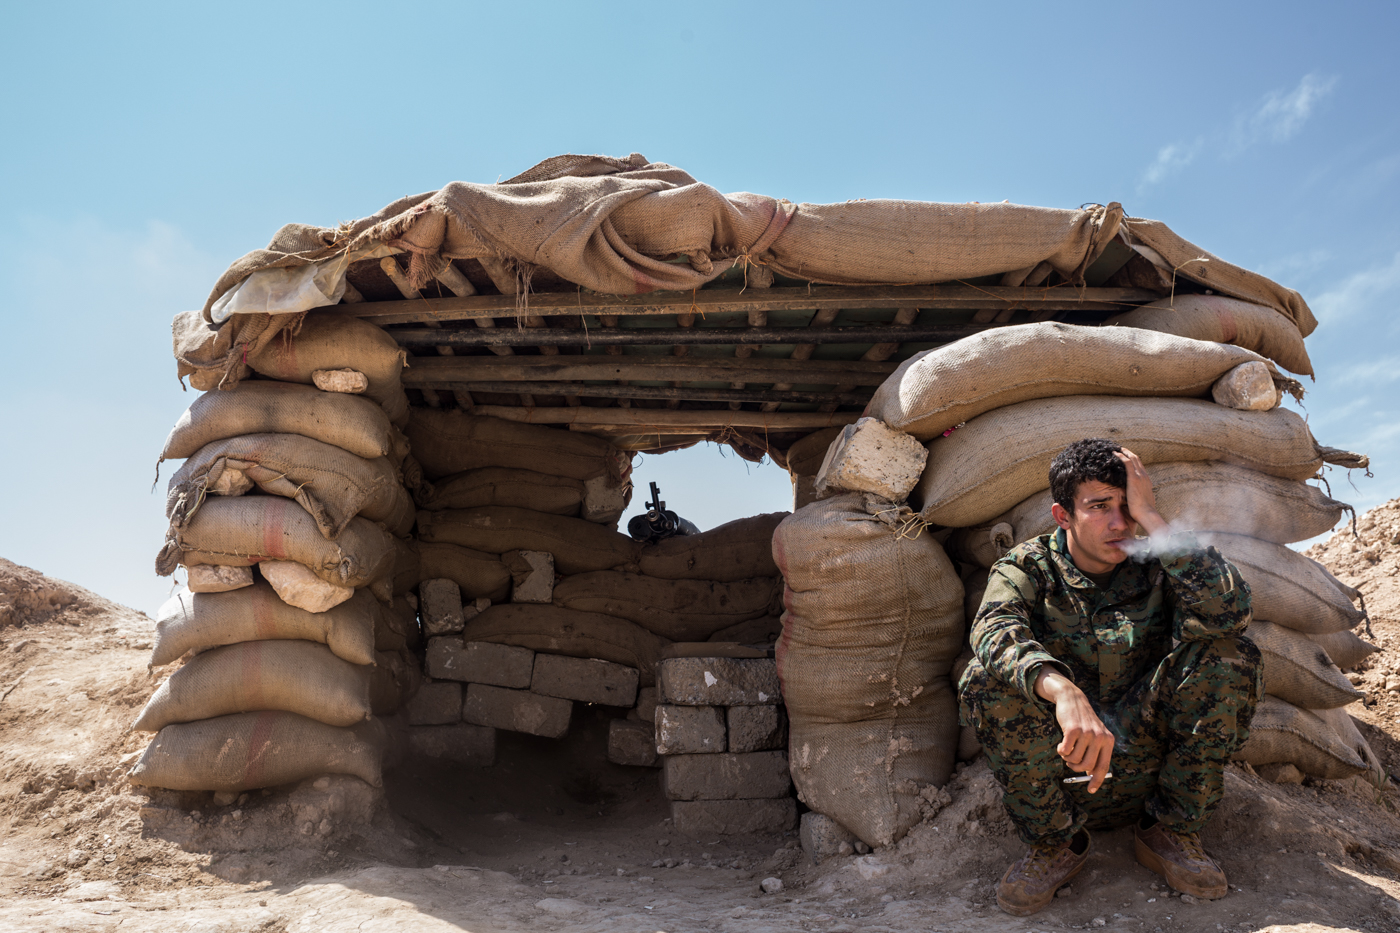 Giacomo_Sini_Italy_The_forgotten_people_of_Kurdistan_19.jpg